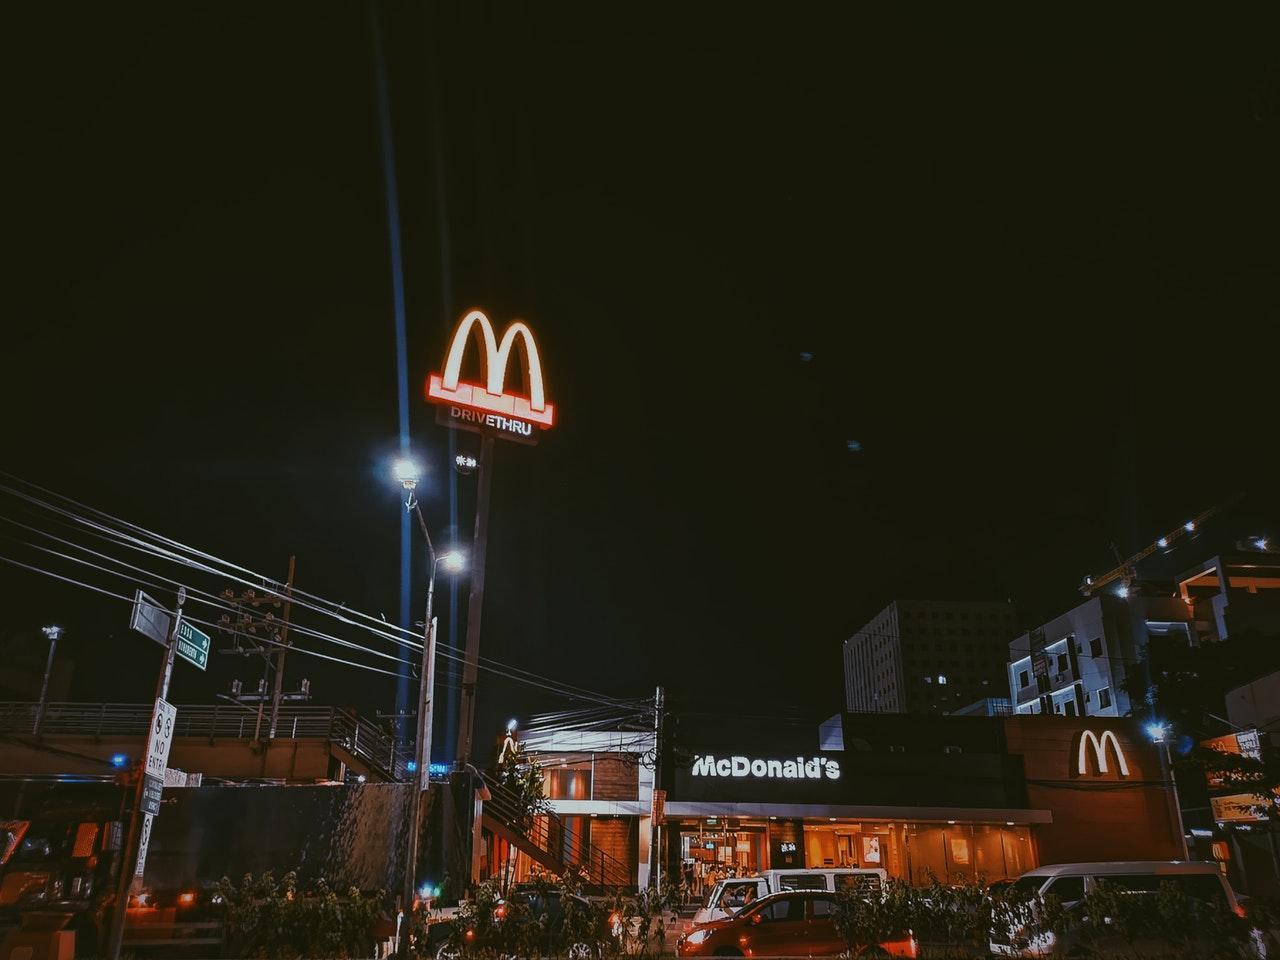 McDonald's: You've Lost That Lovin' Feelin'